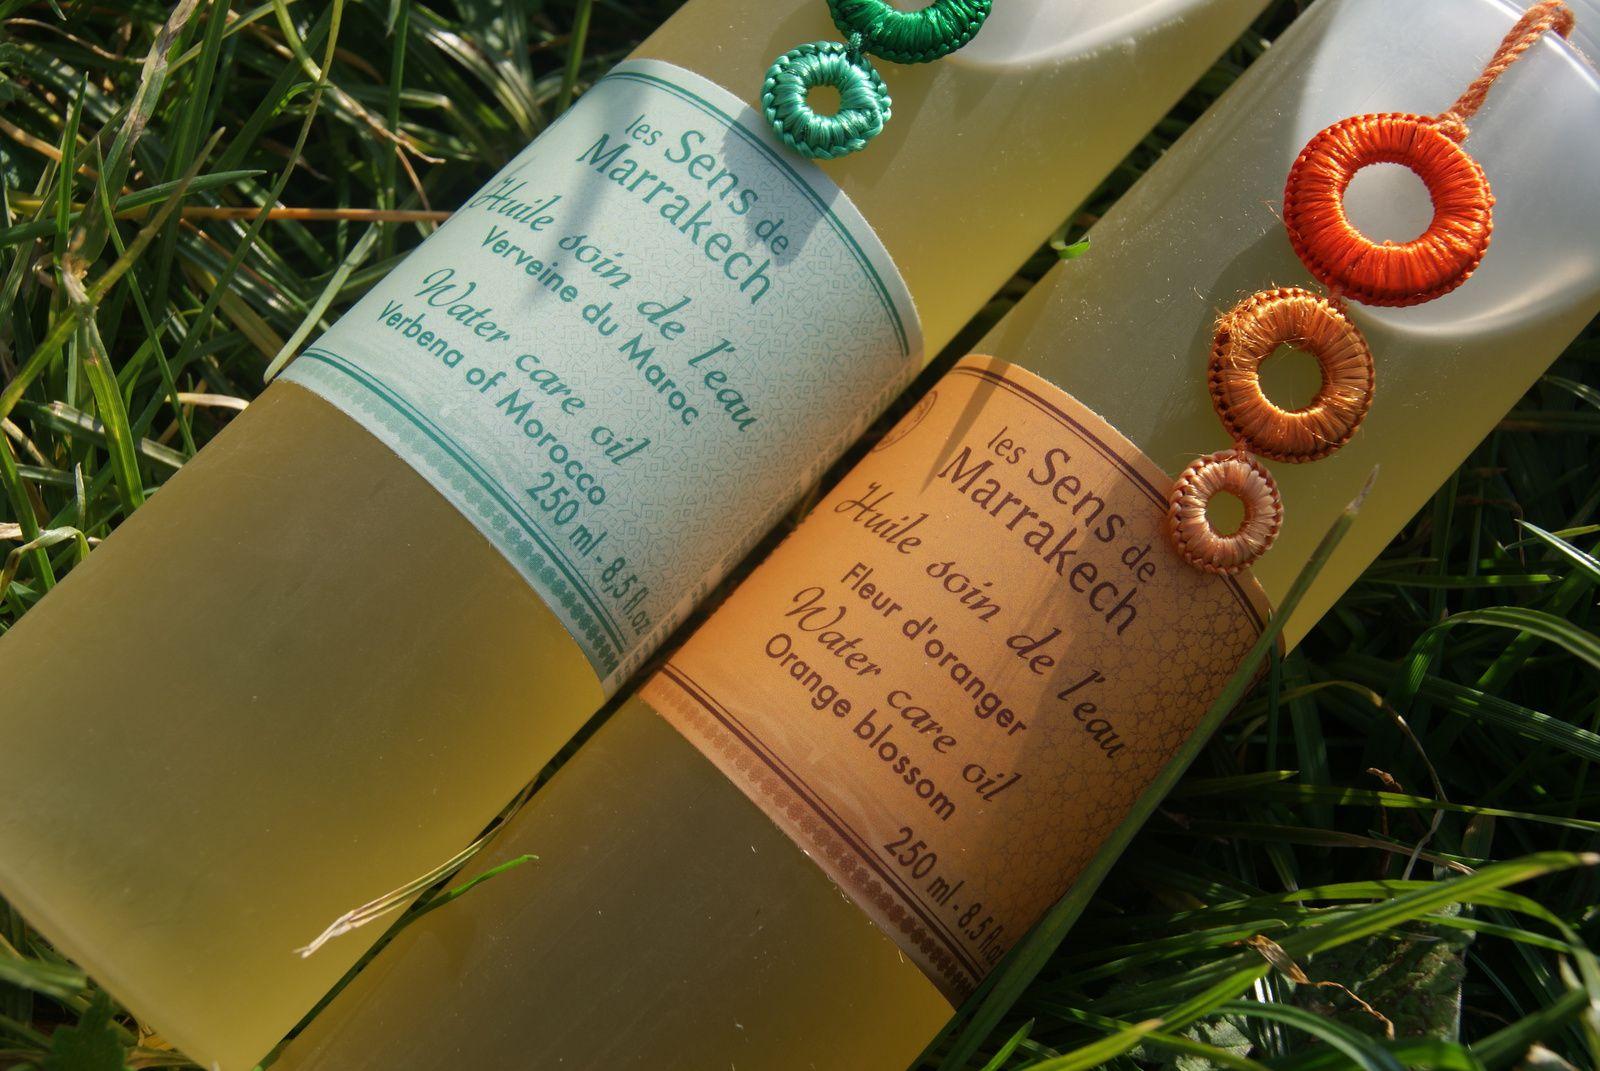 Les huiles à rincer &quot&#x3B;Soin de l'eau&quot&#x3B; Les Sens de Marrakech